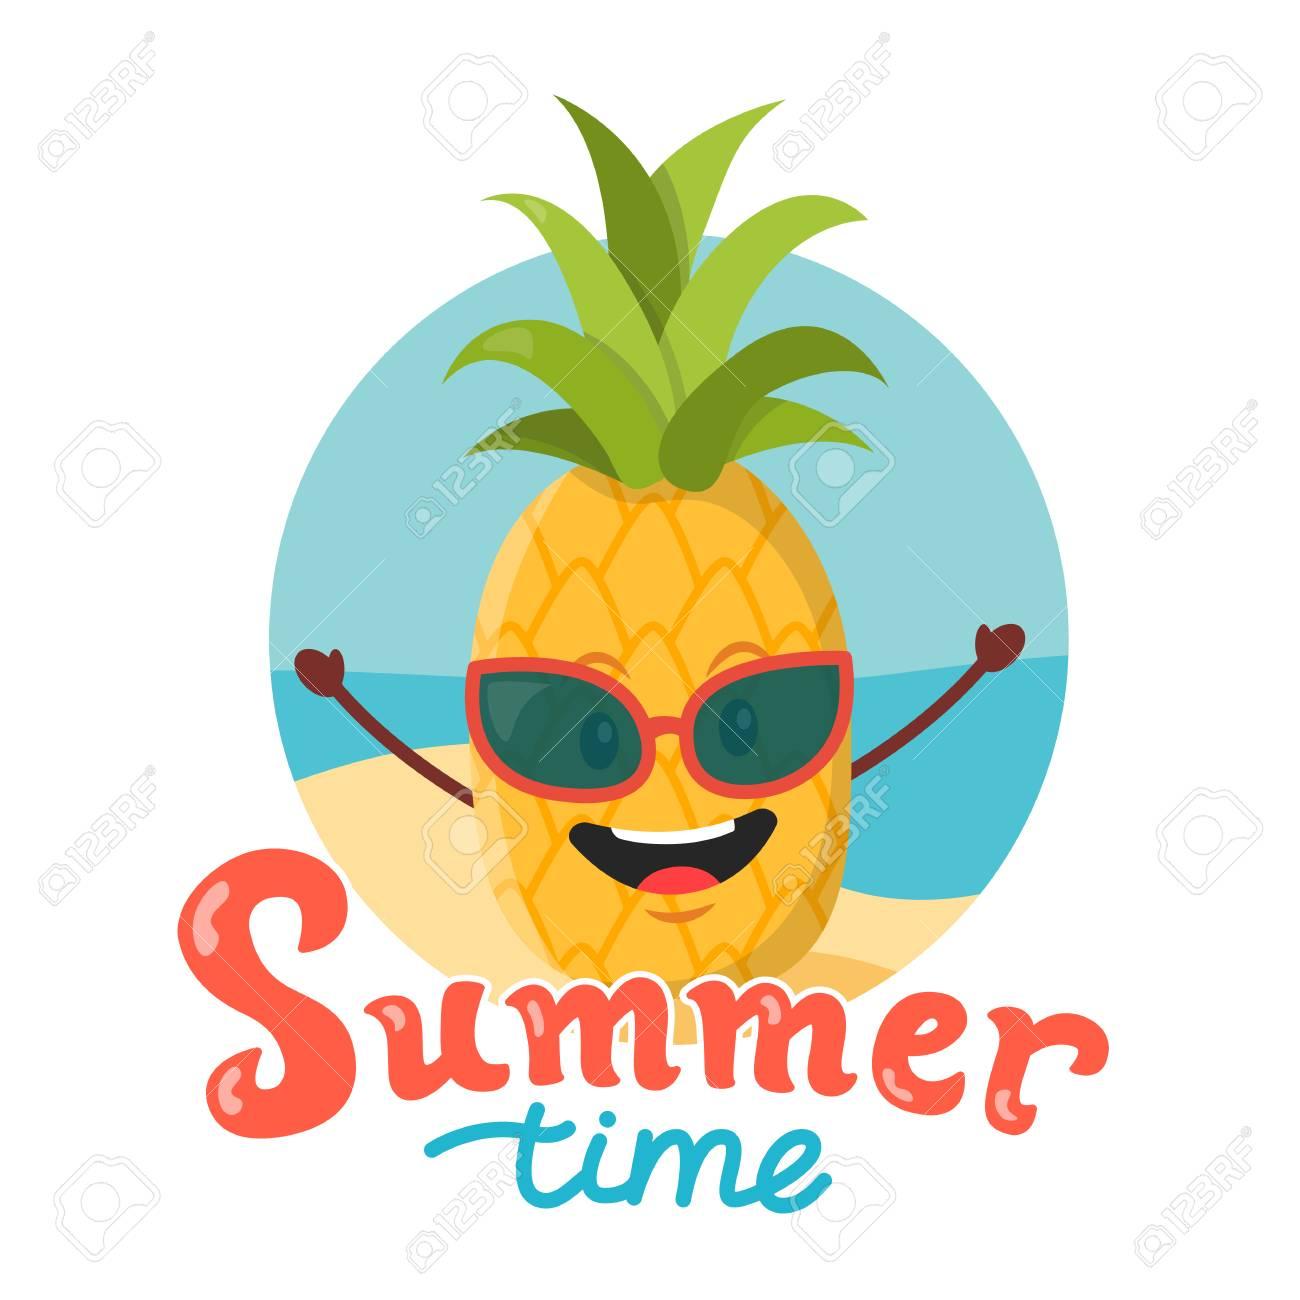 Cute Ananas Dessin Animé Illustration Vectorielle